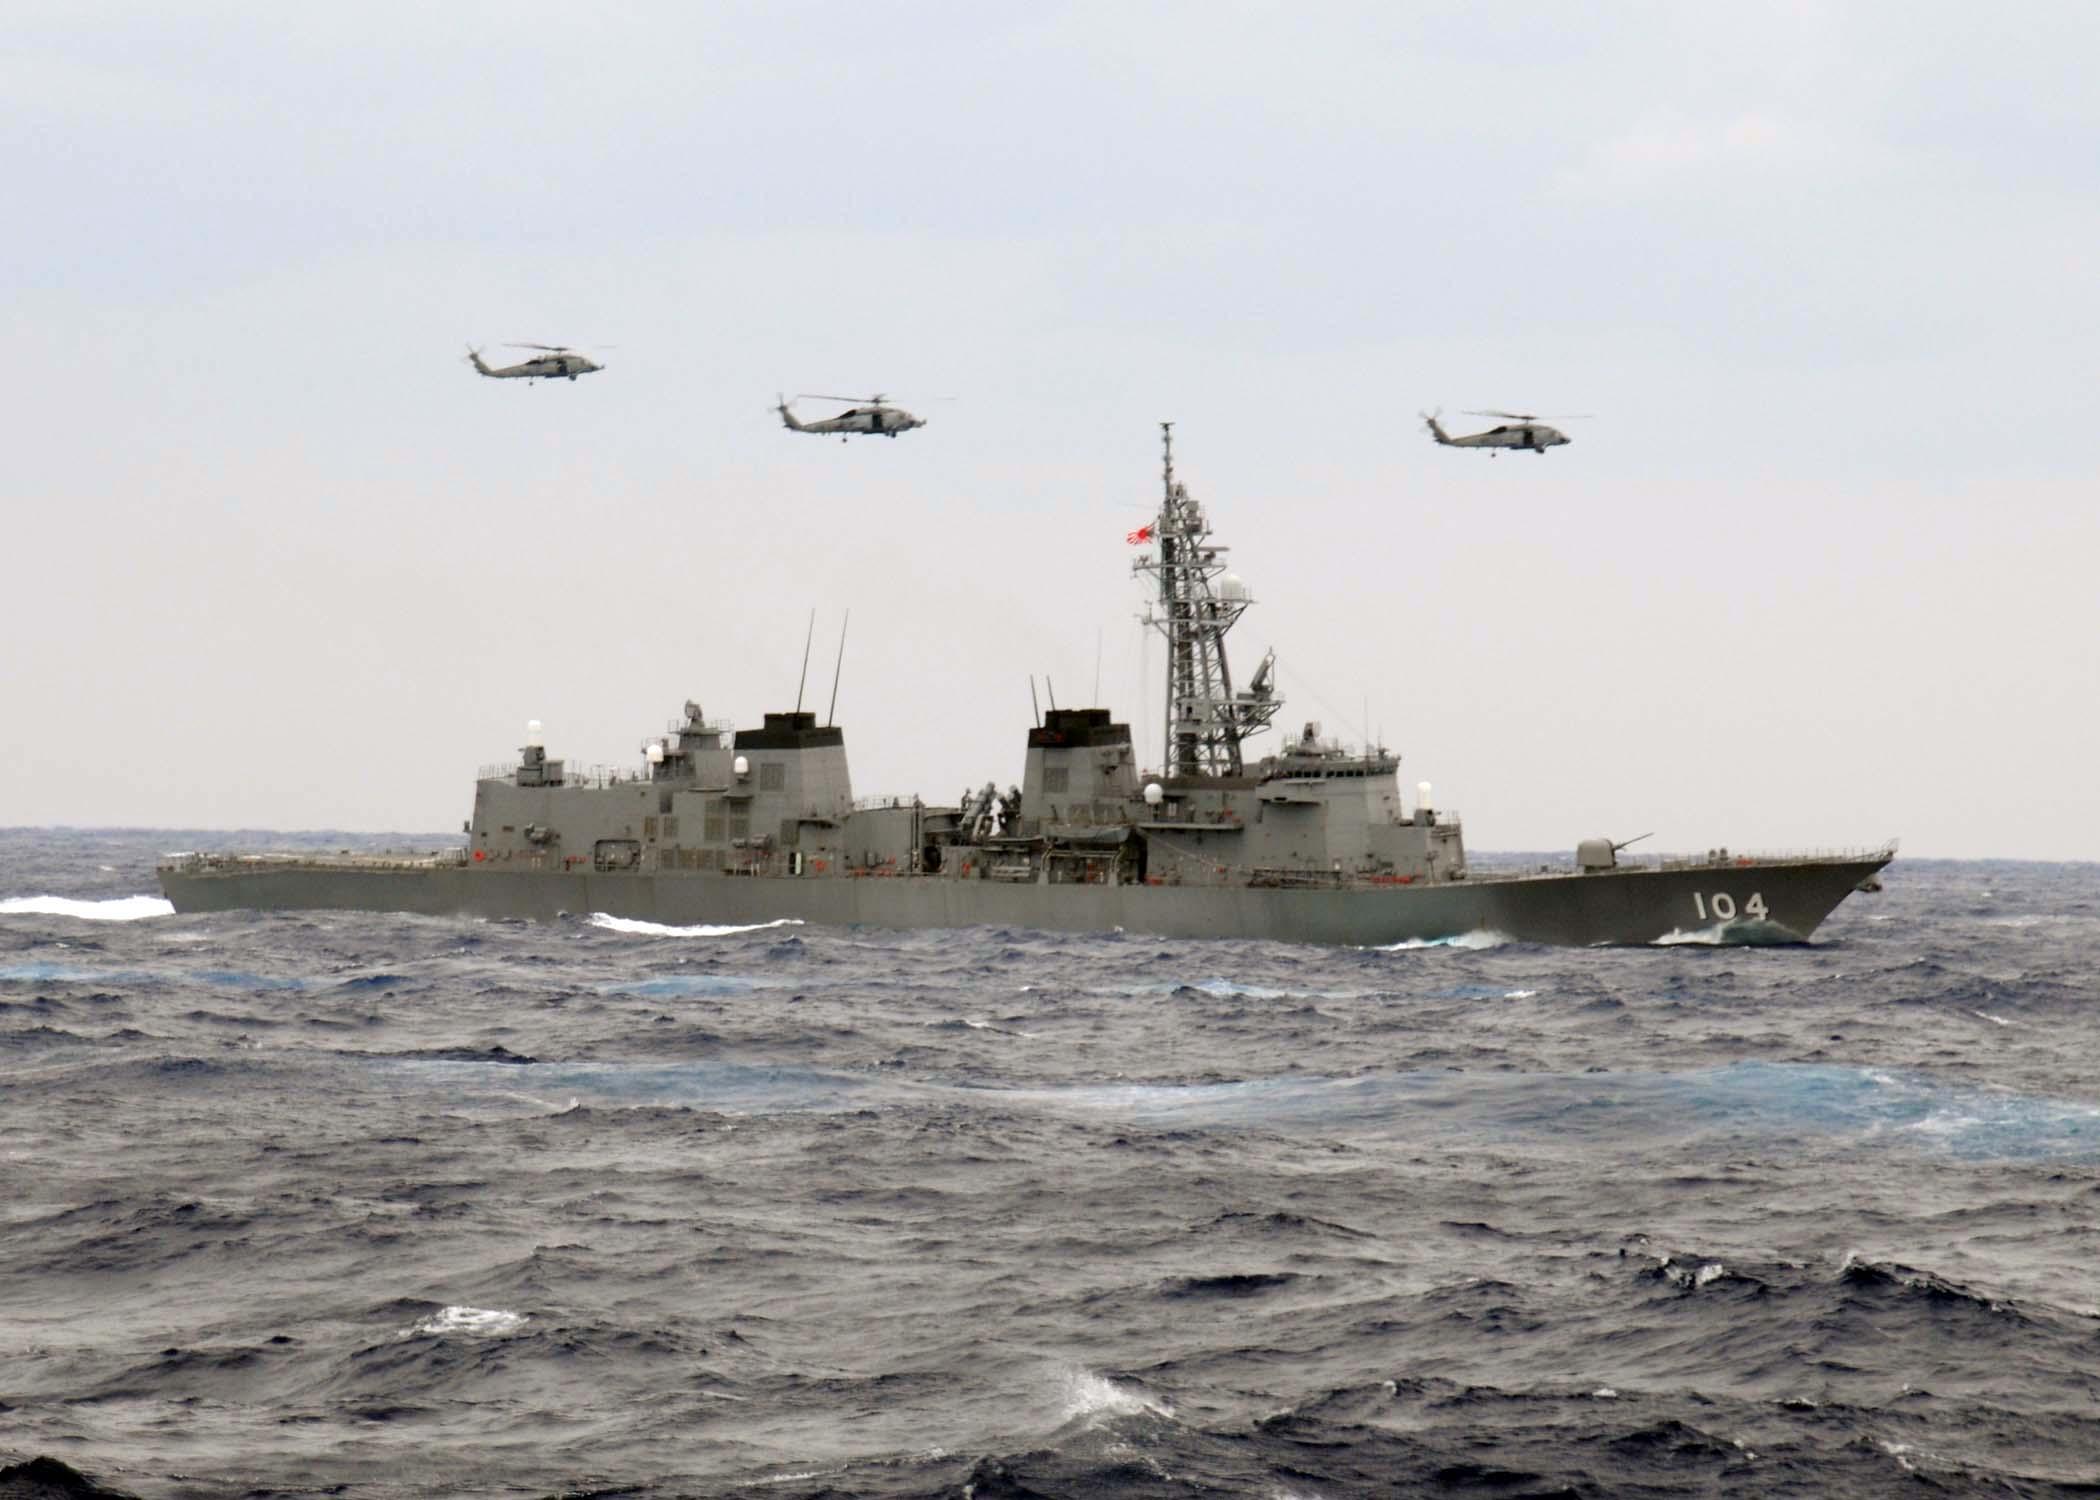 United States Marine Corps Force Reconnaissance